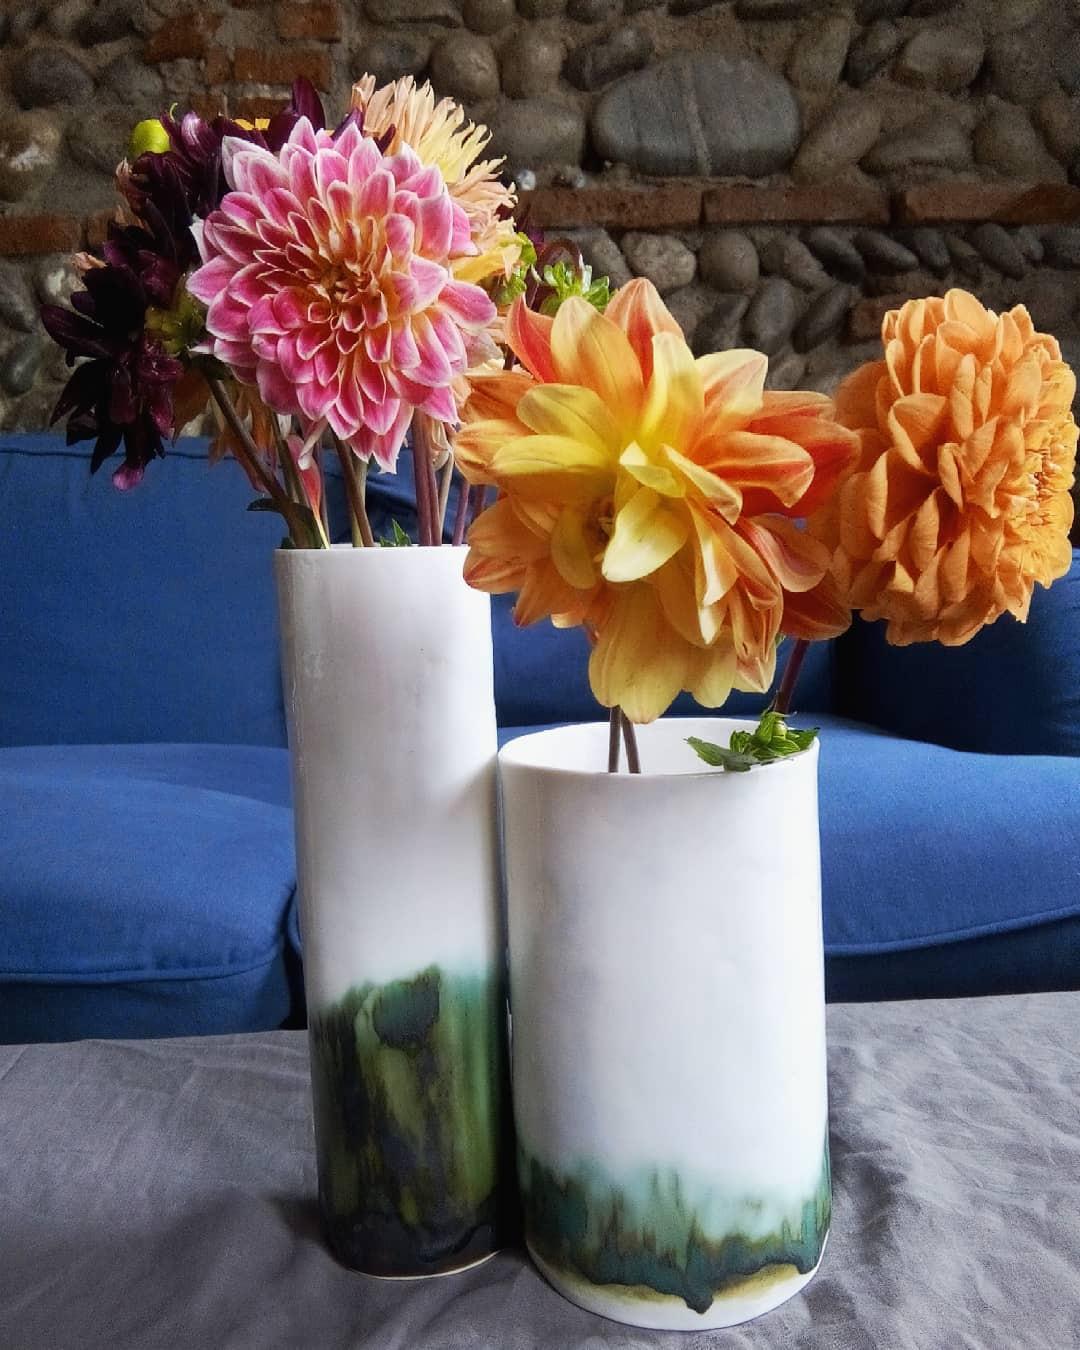 25 Unique Bjorn Wiinblad Vase 2021 free download bjorn wiinblad vase of porcelainvase hash tags deskgram regarding dabut dautomne en bonne compagnie vase porcelaine porcelainvase handmade